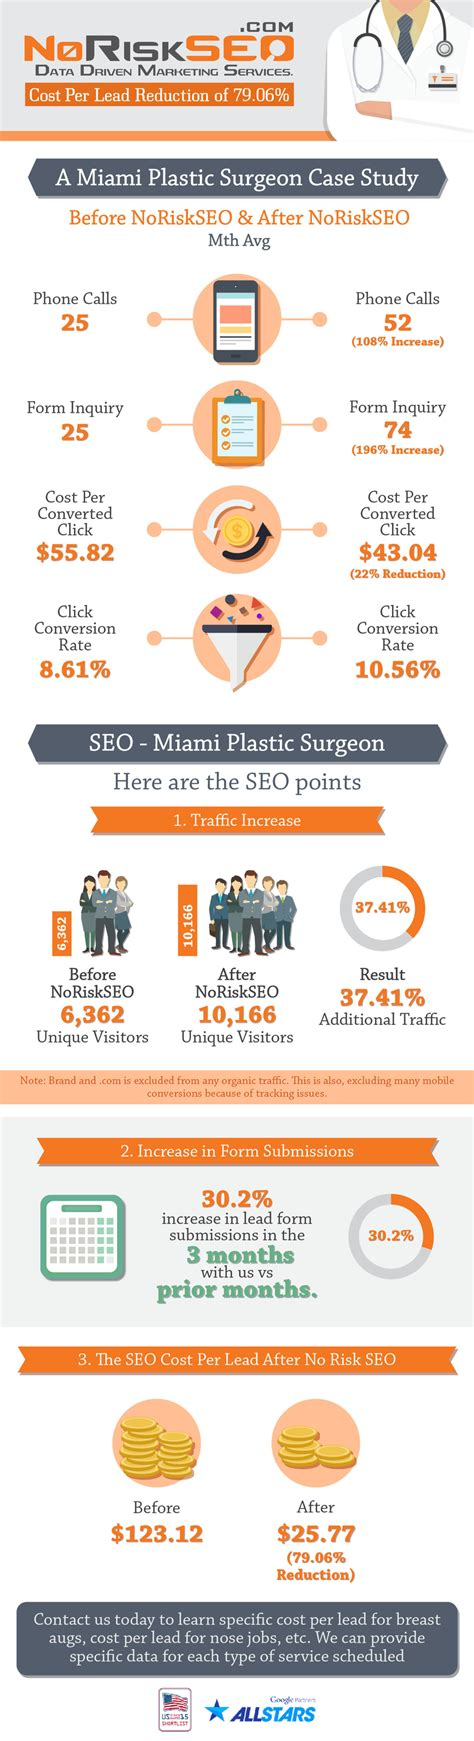 plastic surgeon seo company infographic noriskseo